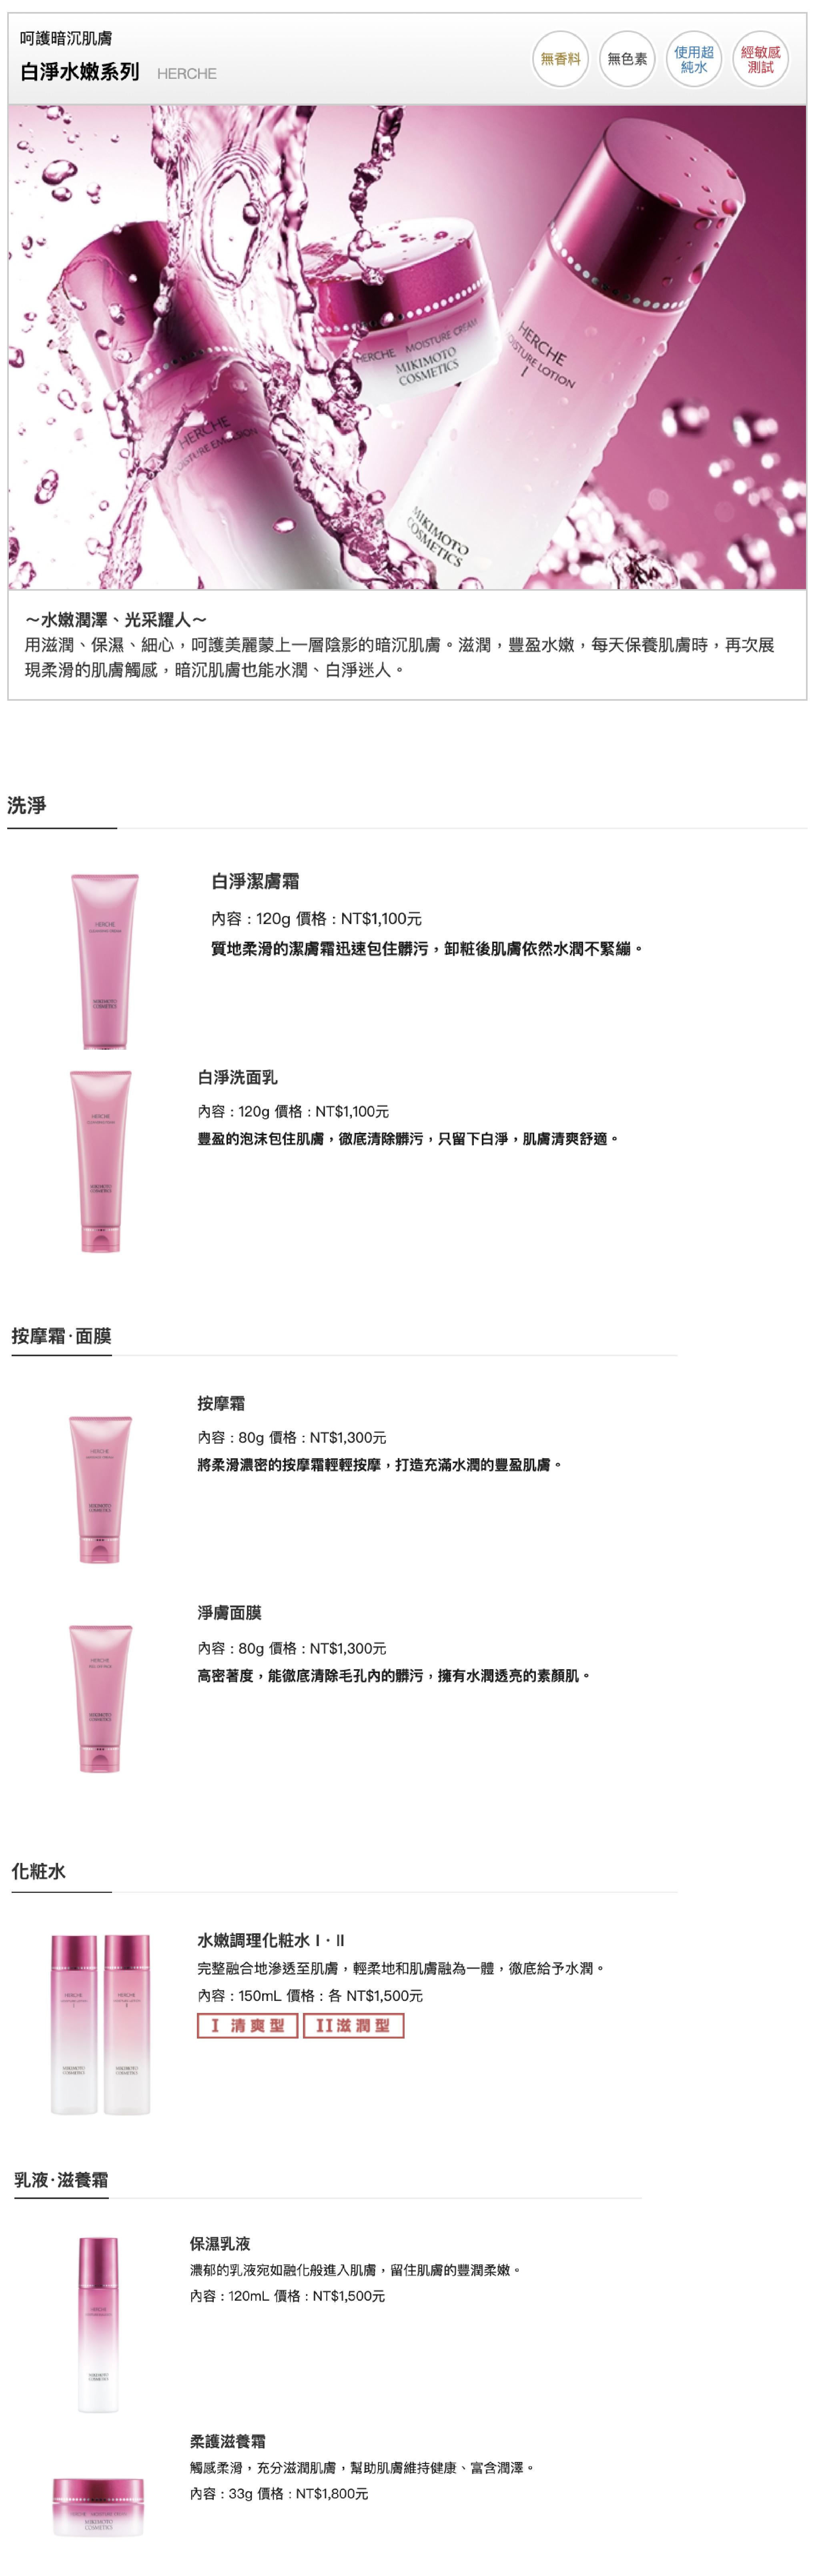 MIKIMOTO 珍珠 膠原蛋白 日系保養品 專櫃保養品